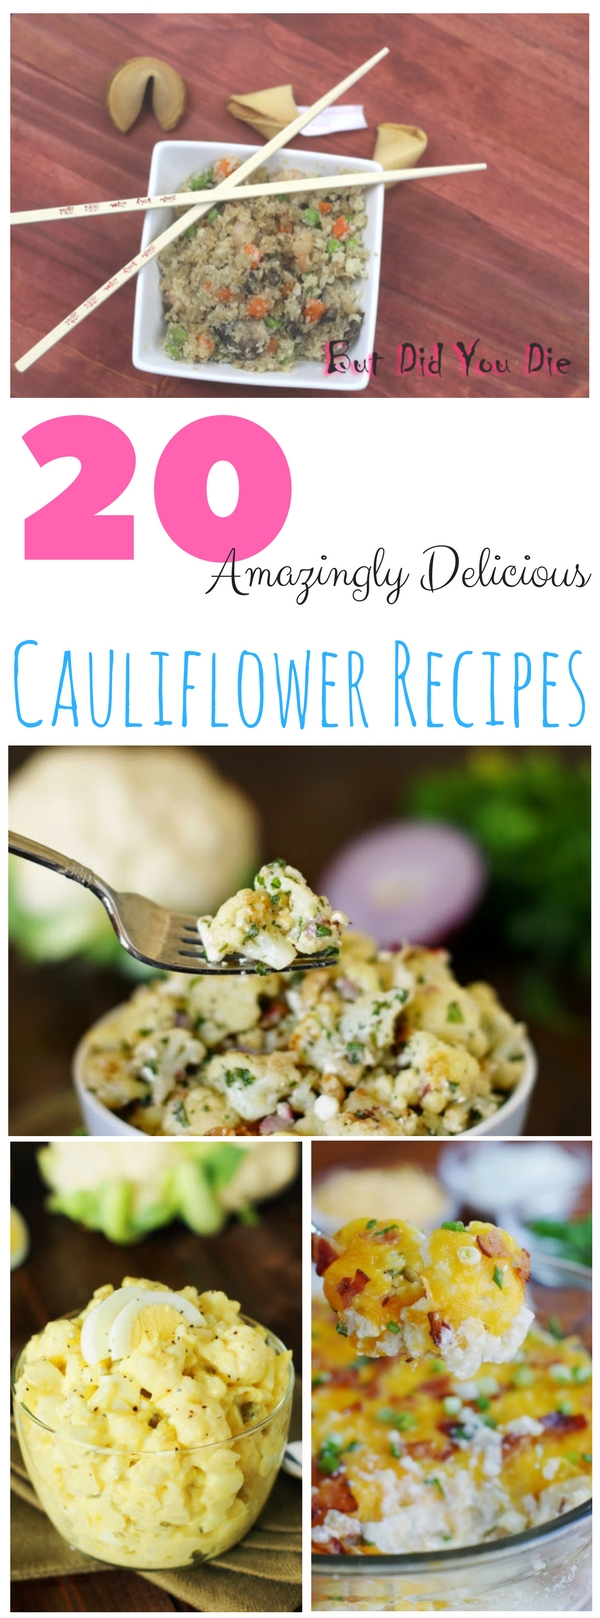 20 Amazingly Delicious Cauliflower Recipes